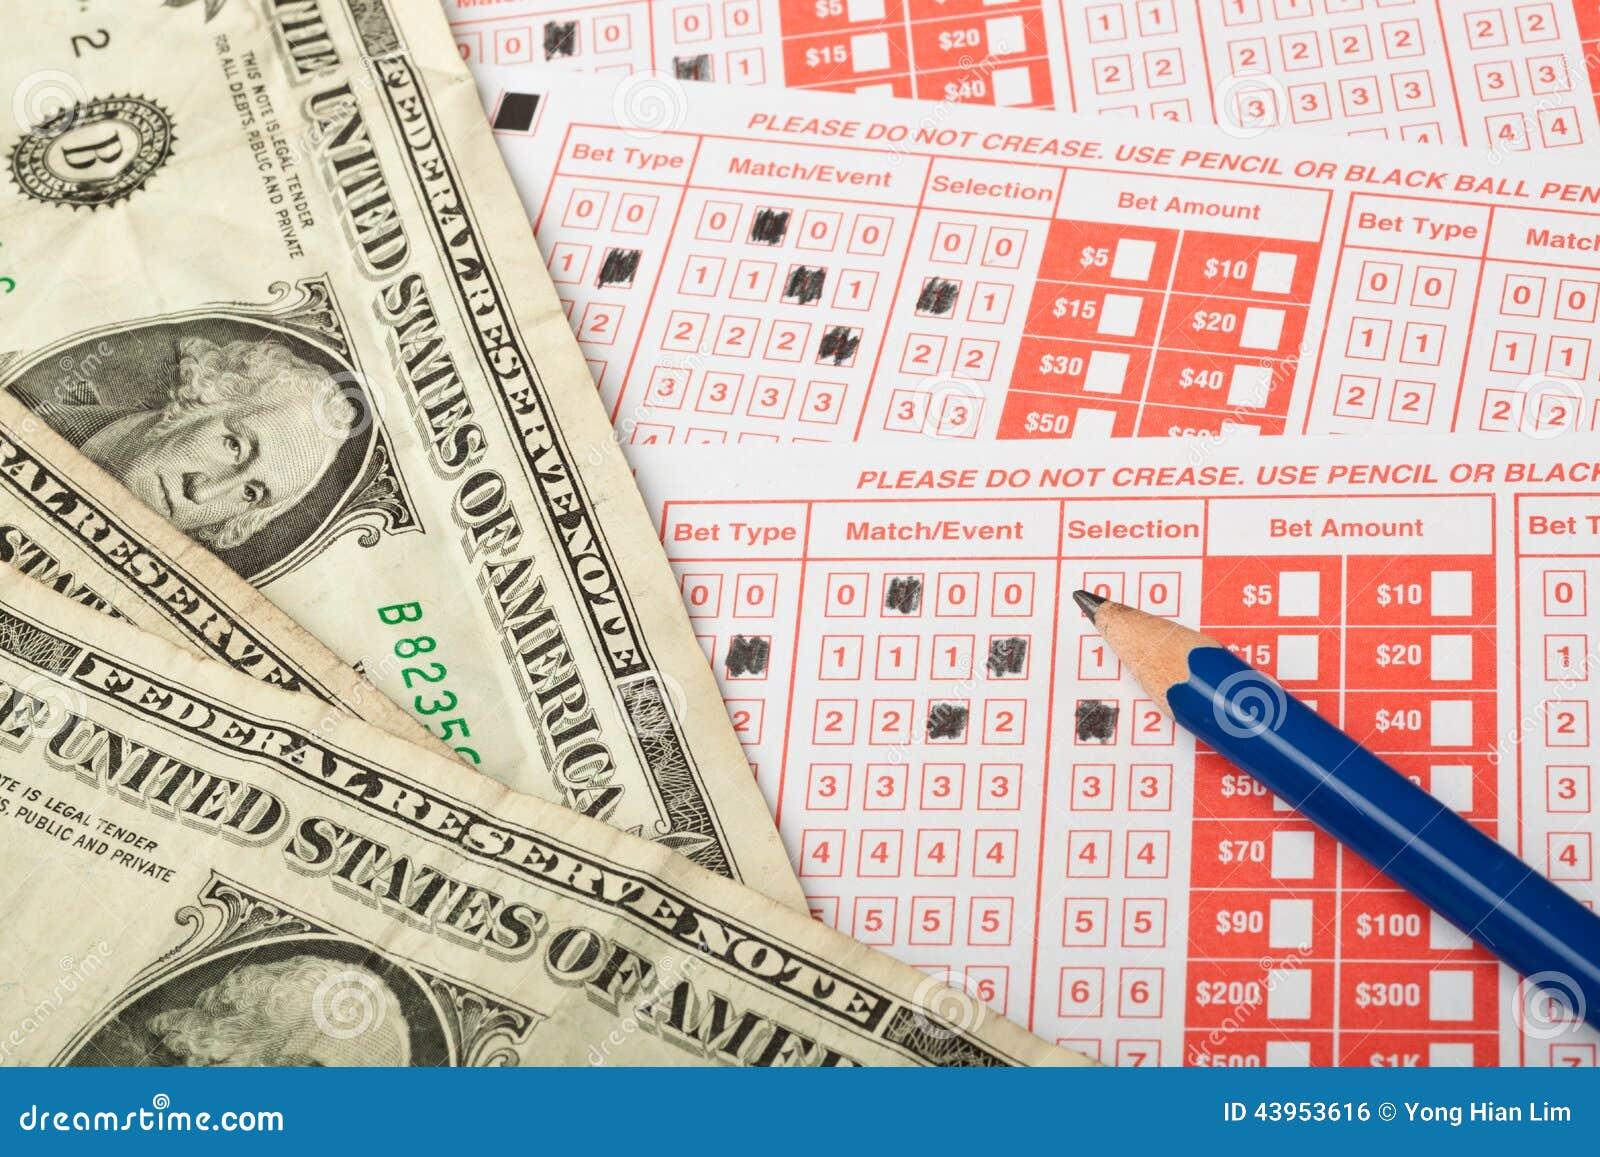 Sport betting oddstyper system casinoLuck skattefria